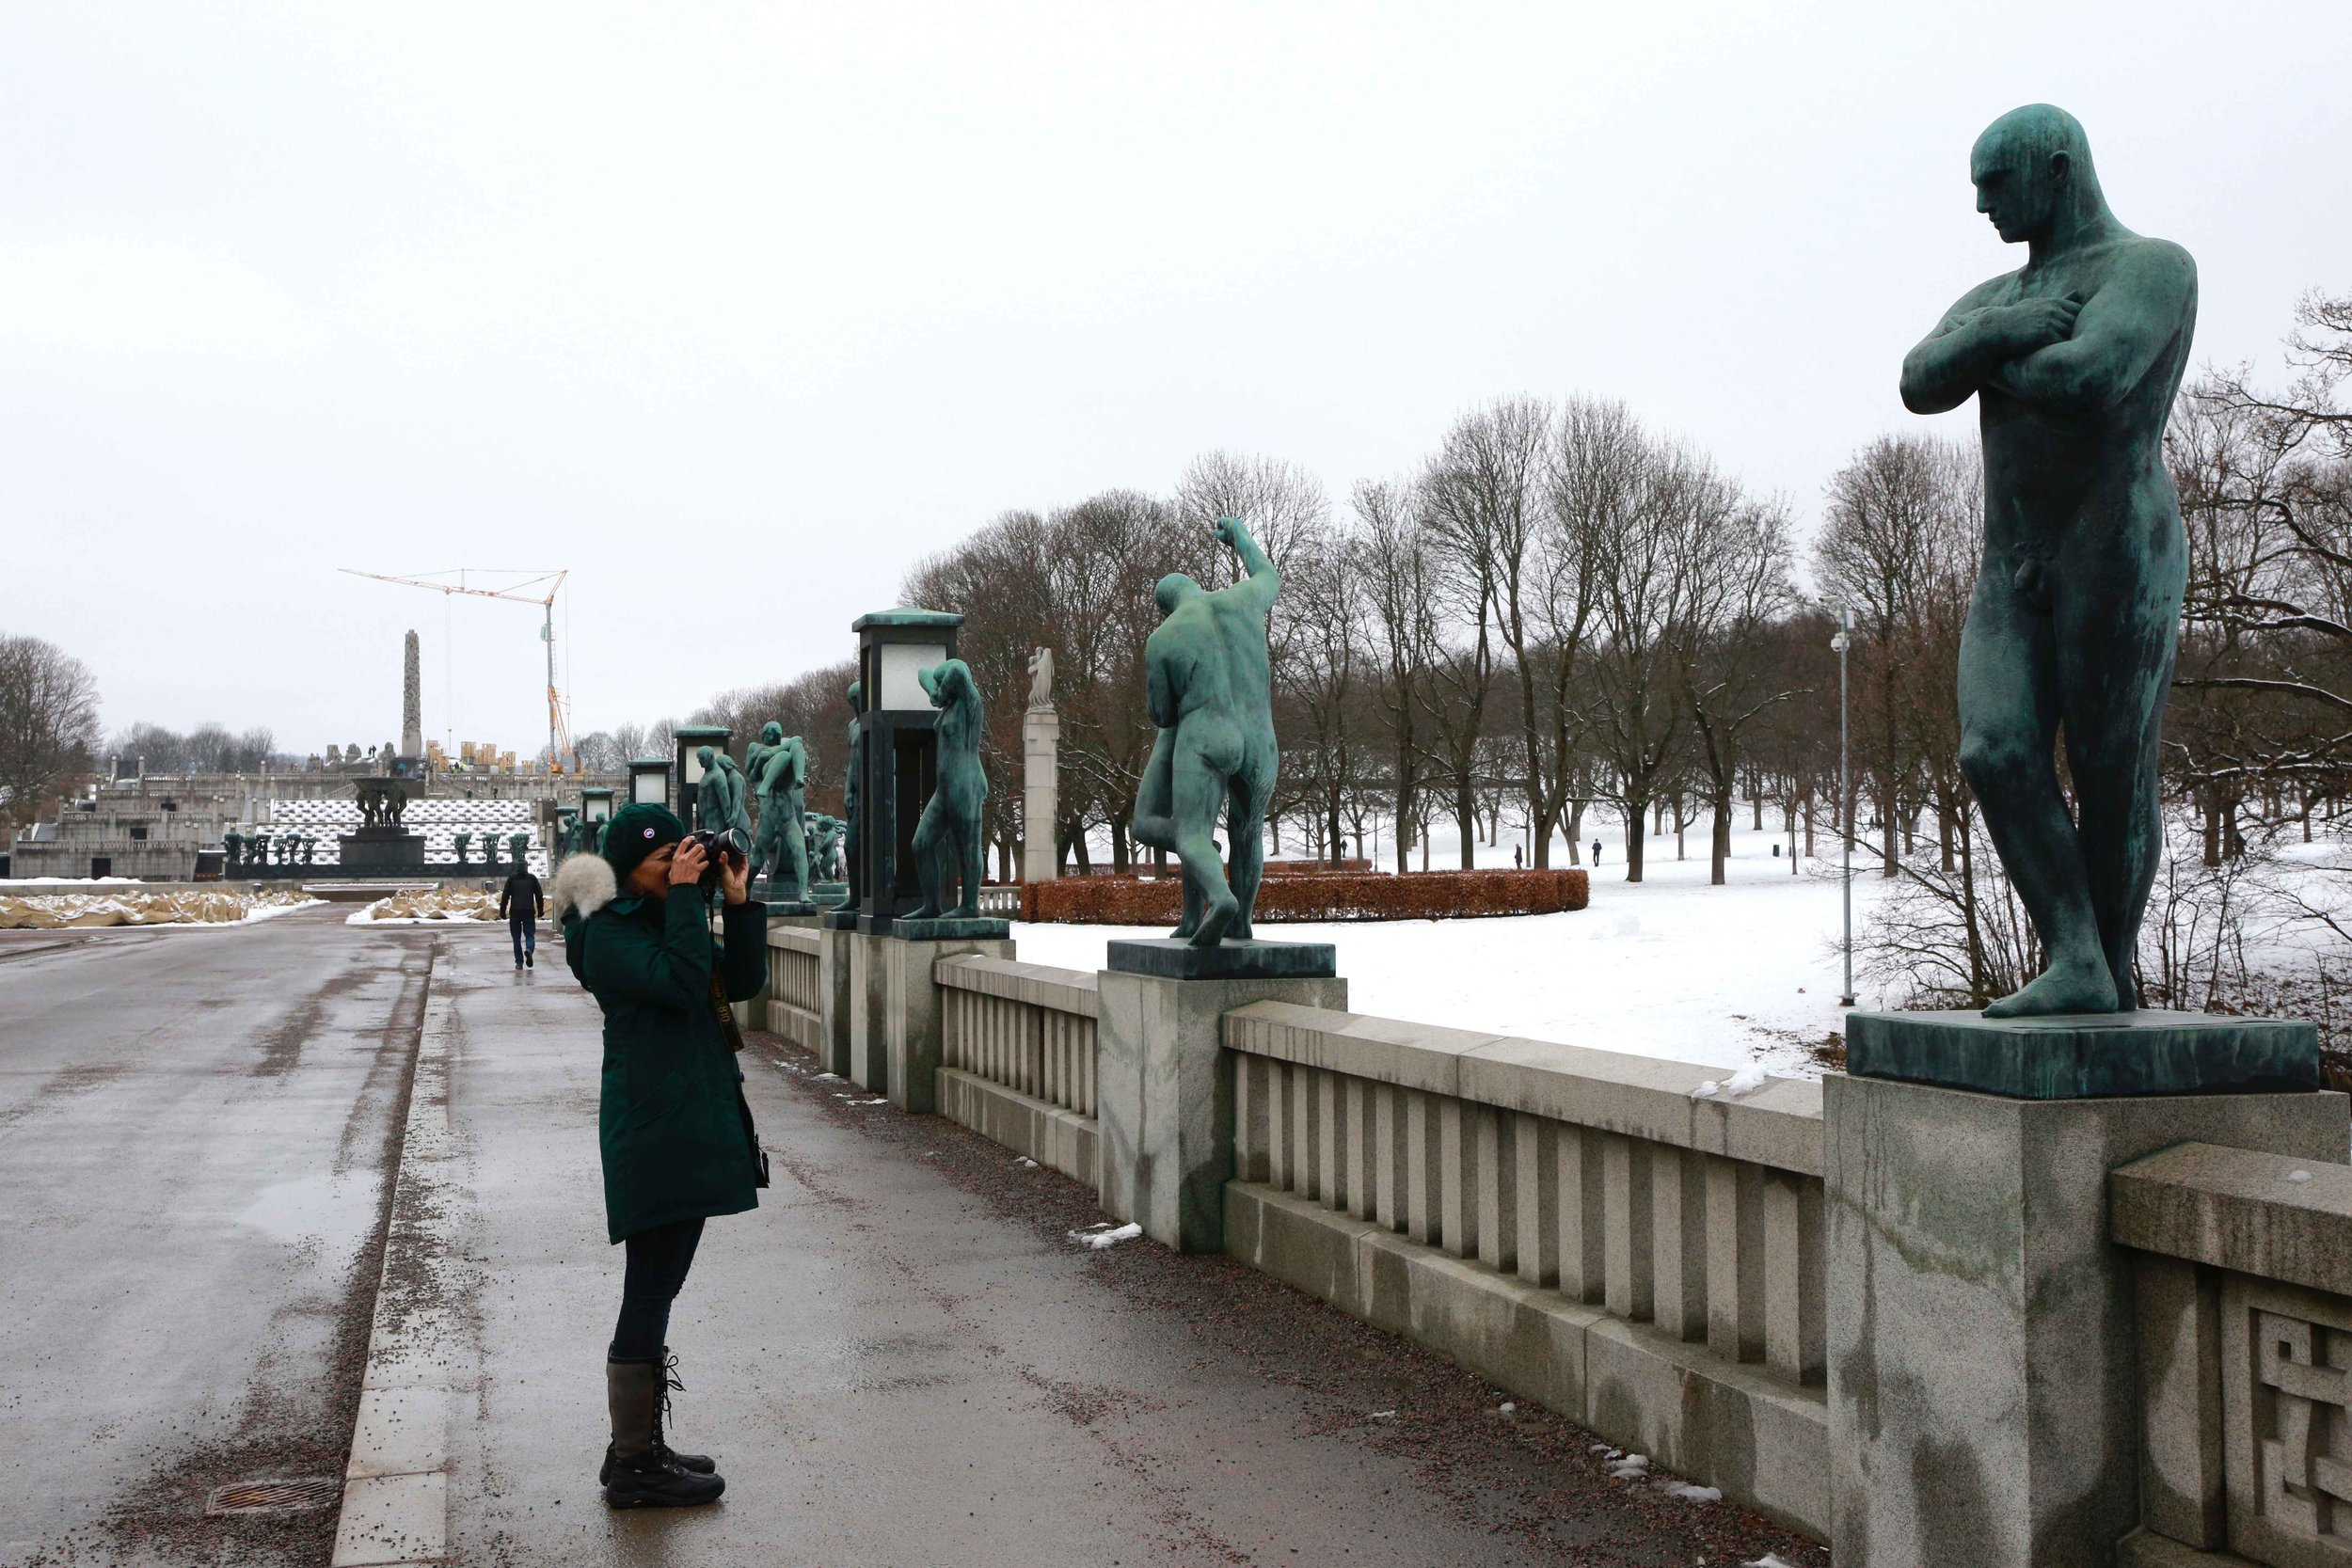 Vigeland Sculpture Park, Oslo, Norway. Photo: Oslo Photo Tour. Image©thingstodot.com